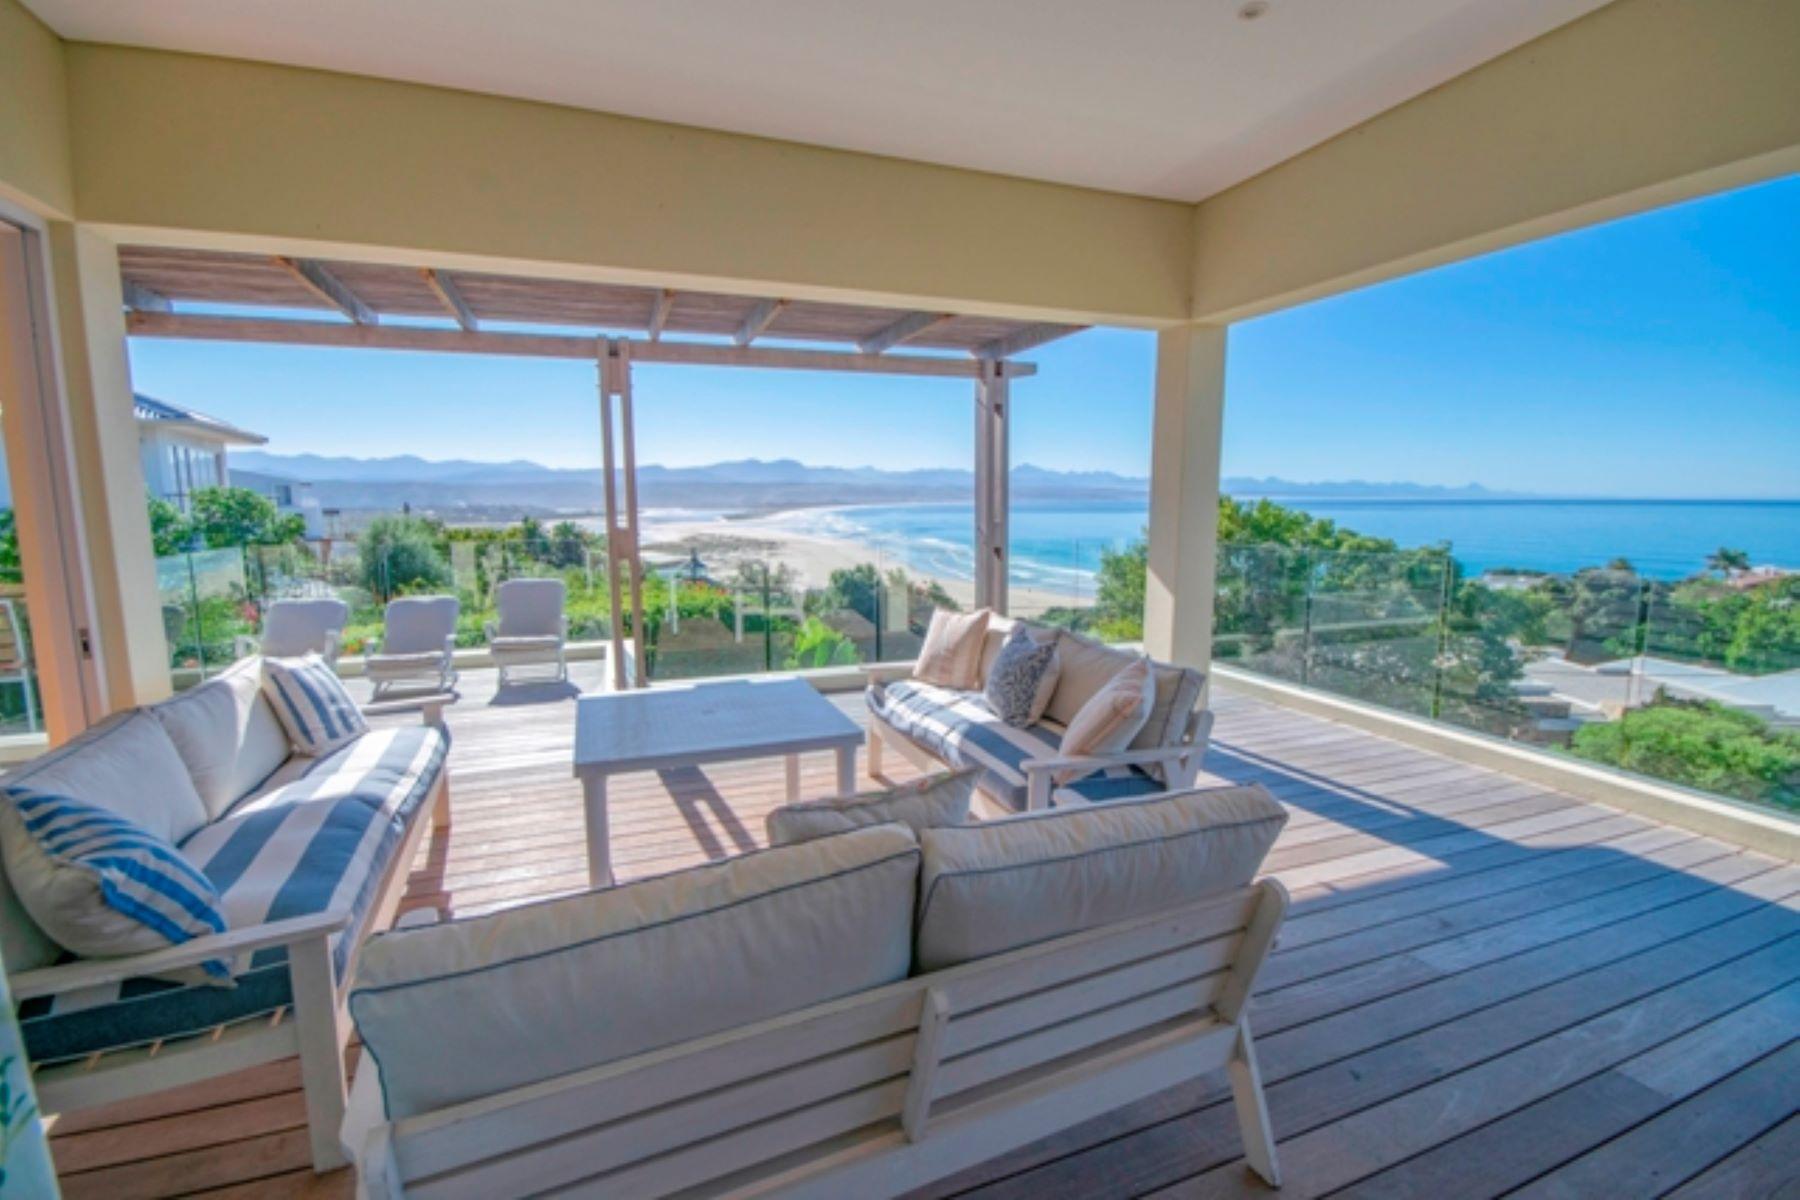 Single Family Homes por un Venta en Furnished Residence with Magnificent Views 9 Gibb Street Plettenberg Bay, Provincia Occidental Del Cabo 6600 Sudáfrica